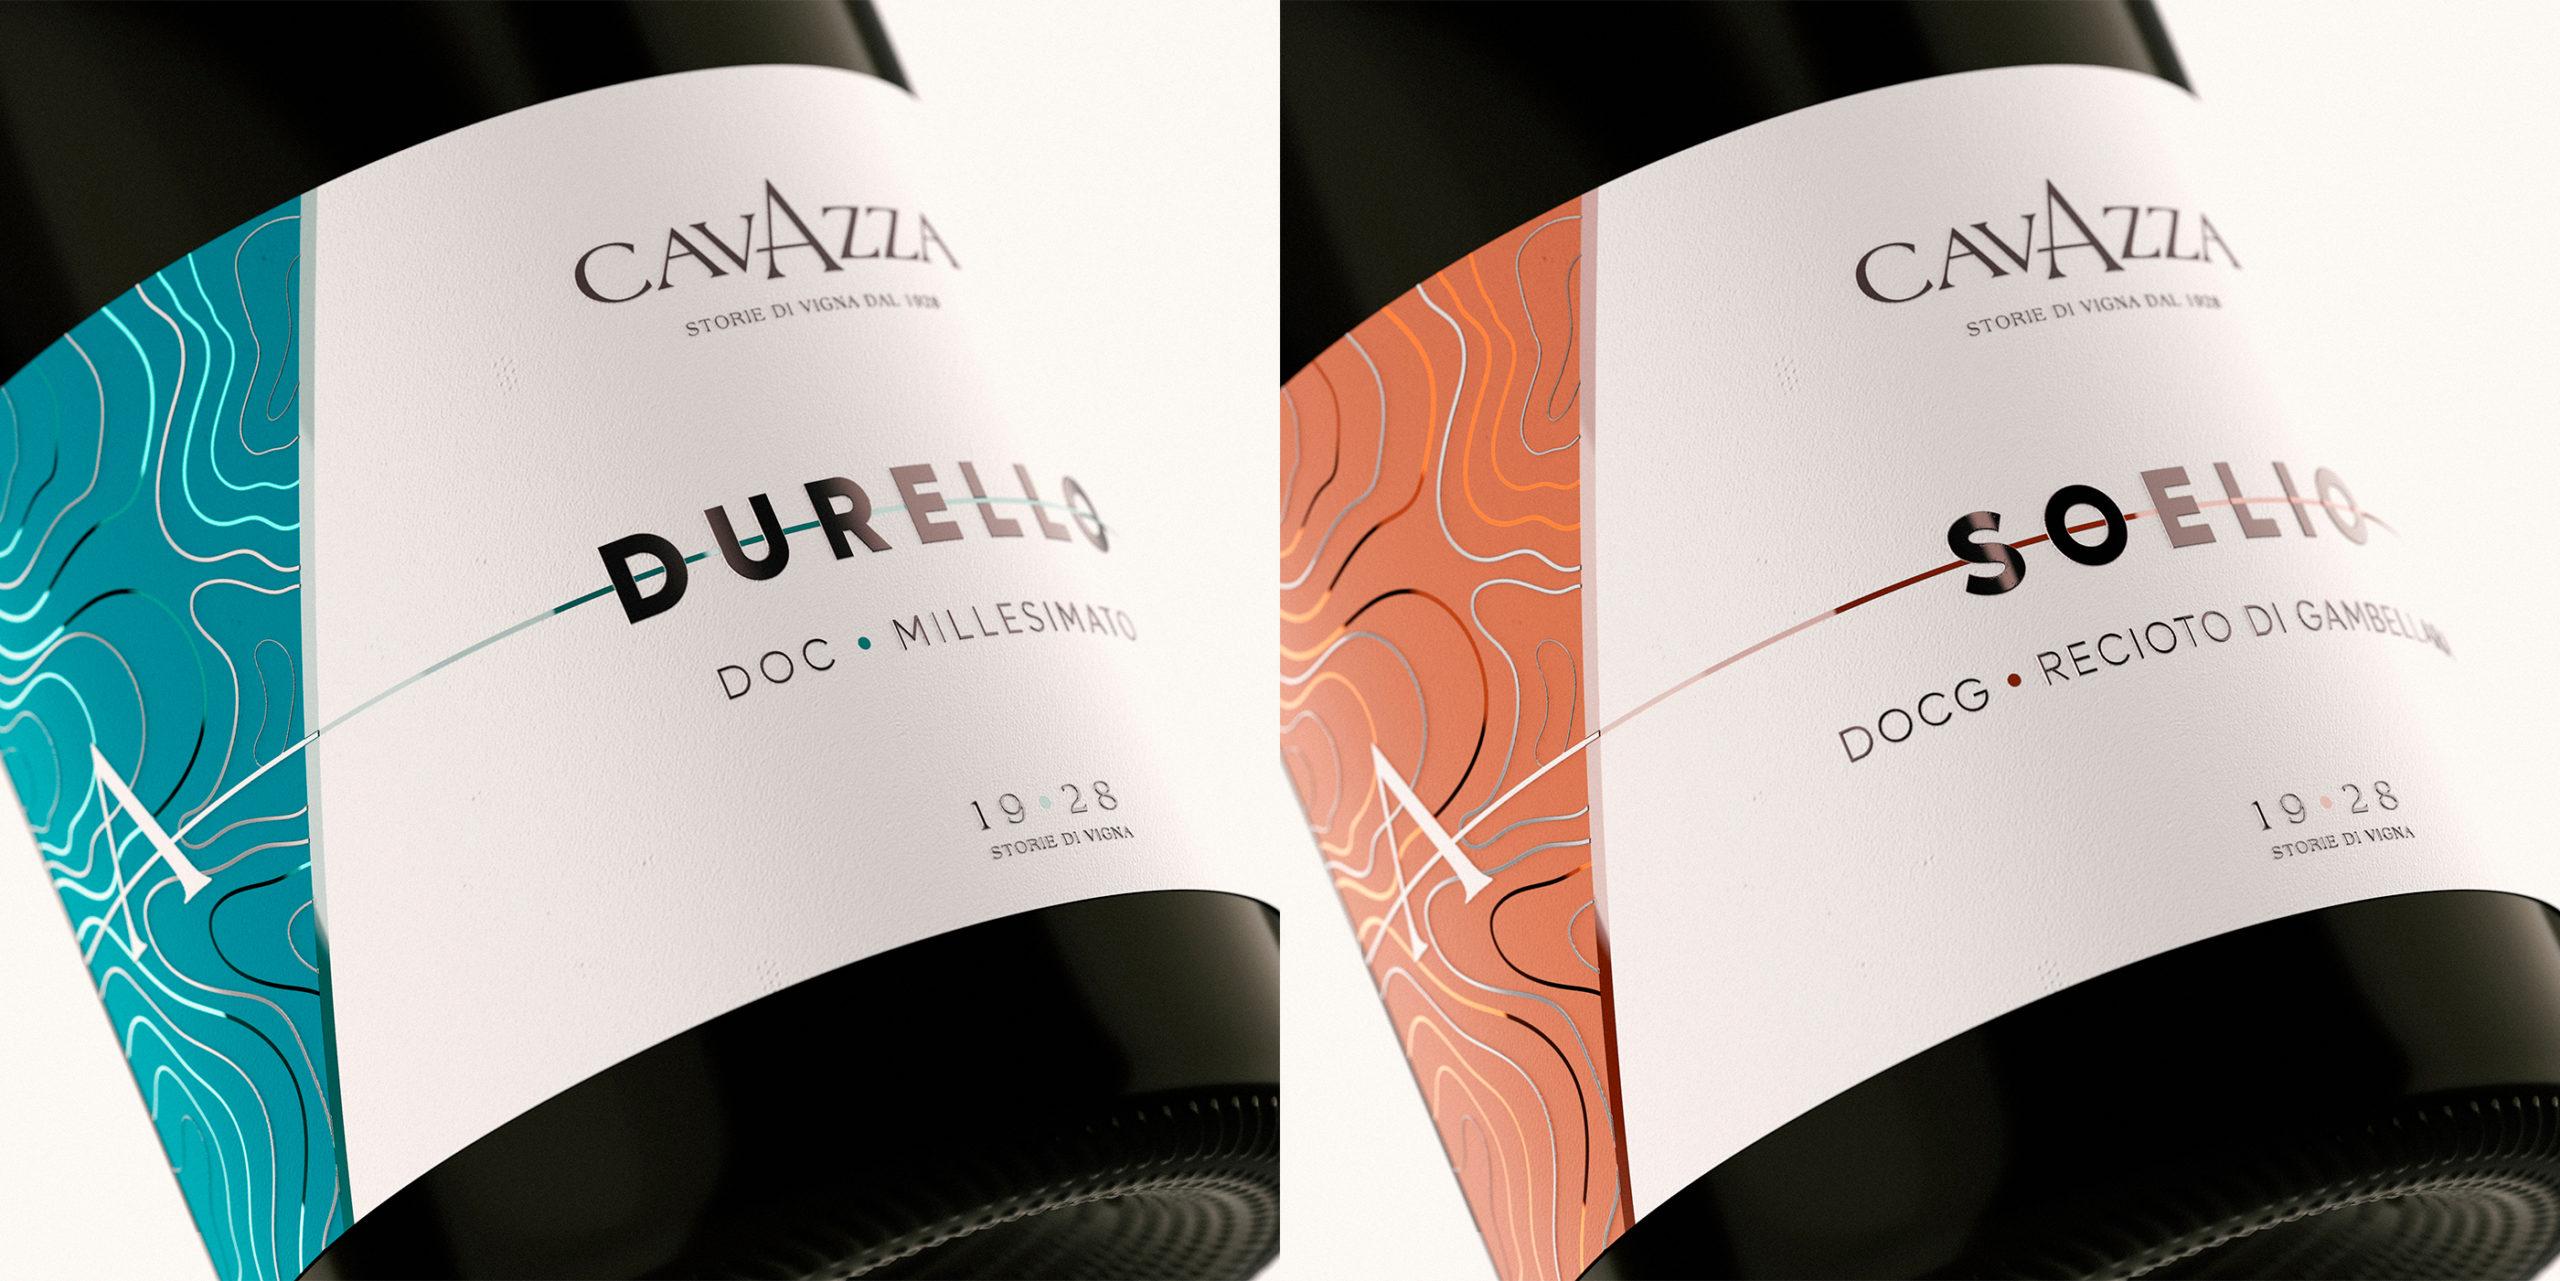 Etichette spumanti Cavazza render close up